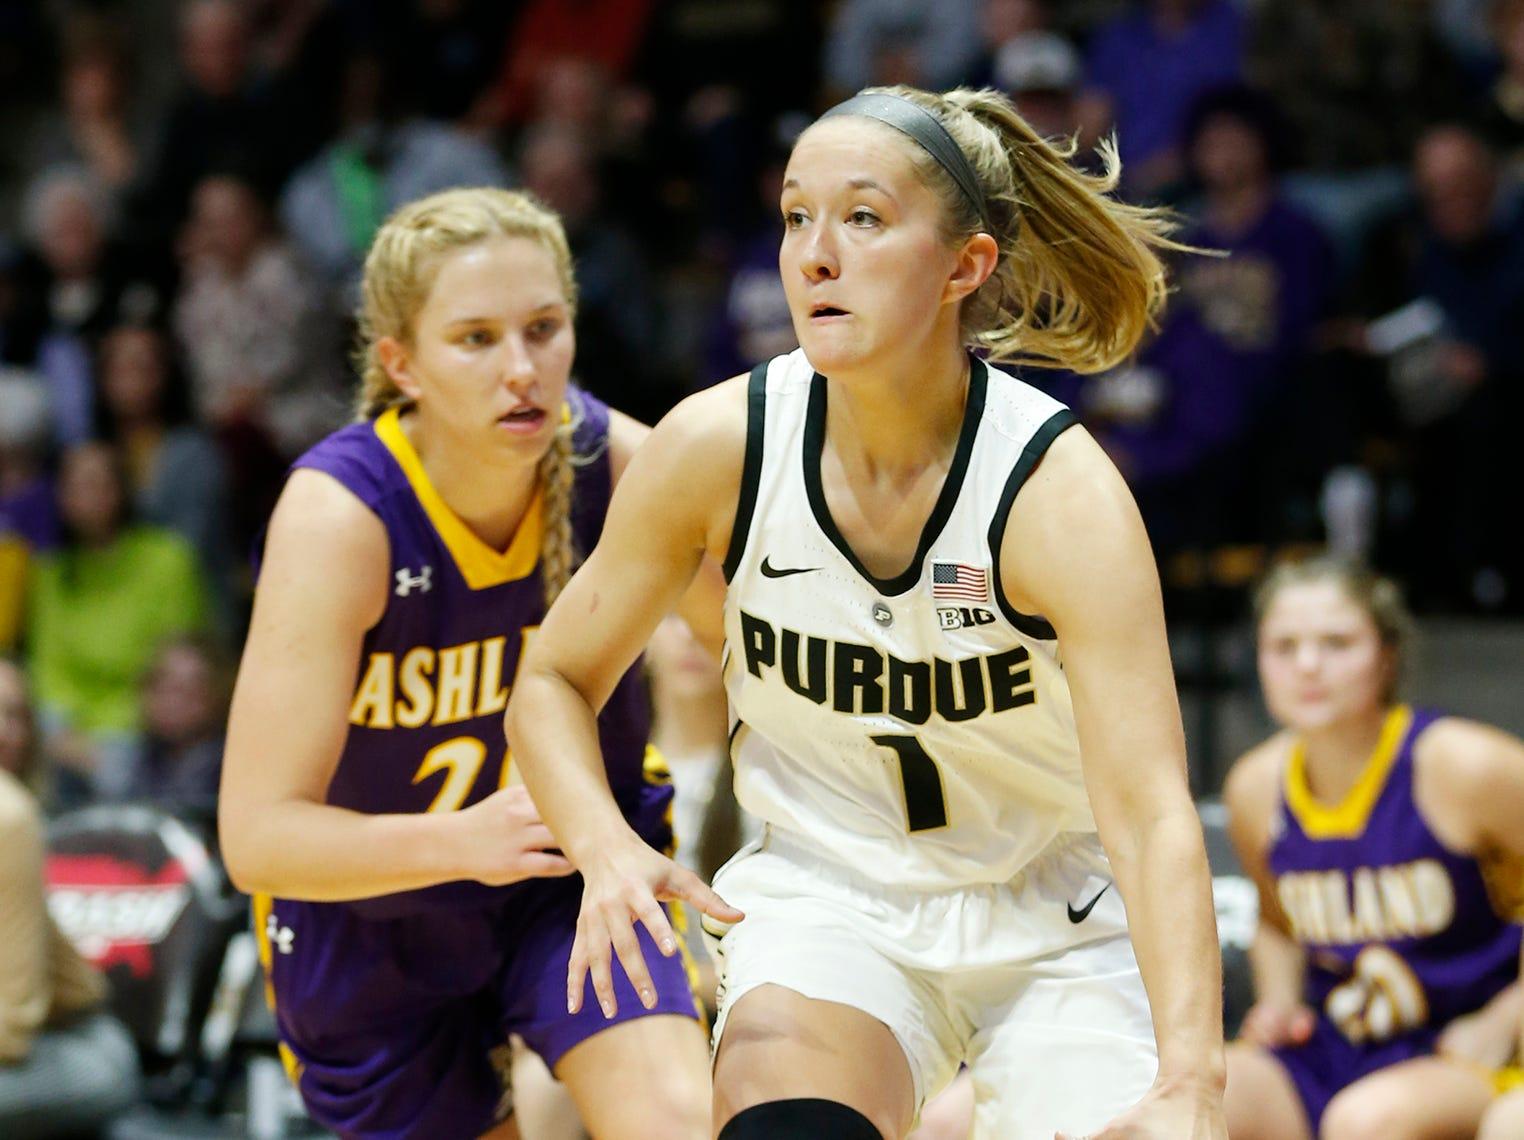 Karissa McLaughlin of Purdue brings the ball up court against Ashland Sunday, November 4, 2018, at Mackey Arena. Purdue defeated Ashland 85-69.